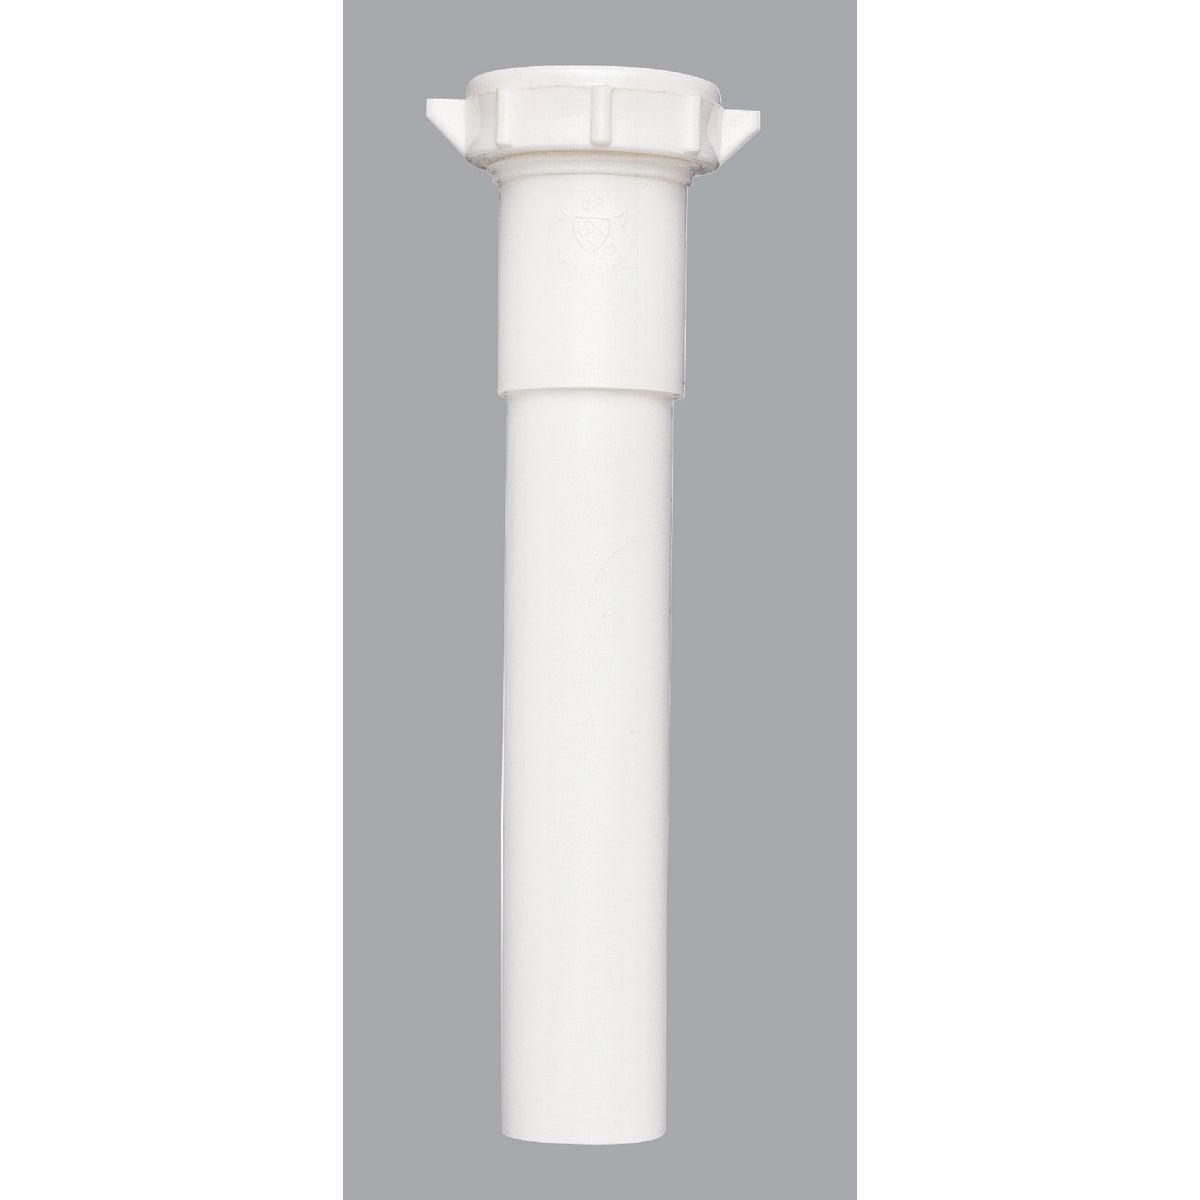 Plumb Pak/Keeney Mfg. 1-1/2X12 WHT SJ EXT TUBE 40-12WK